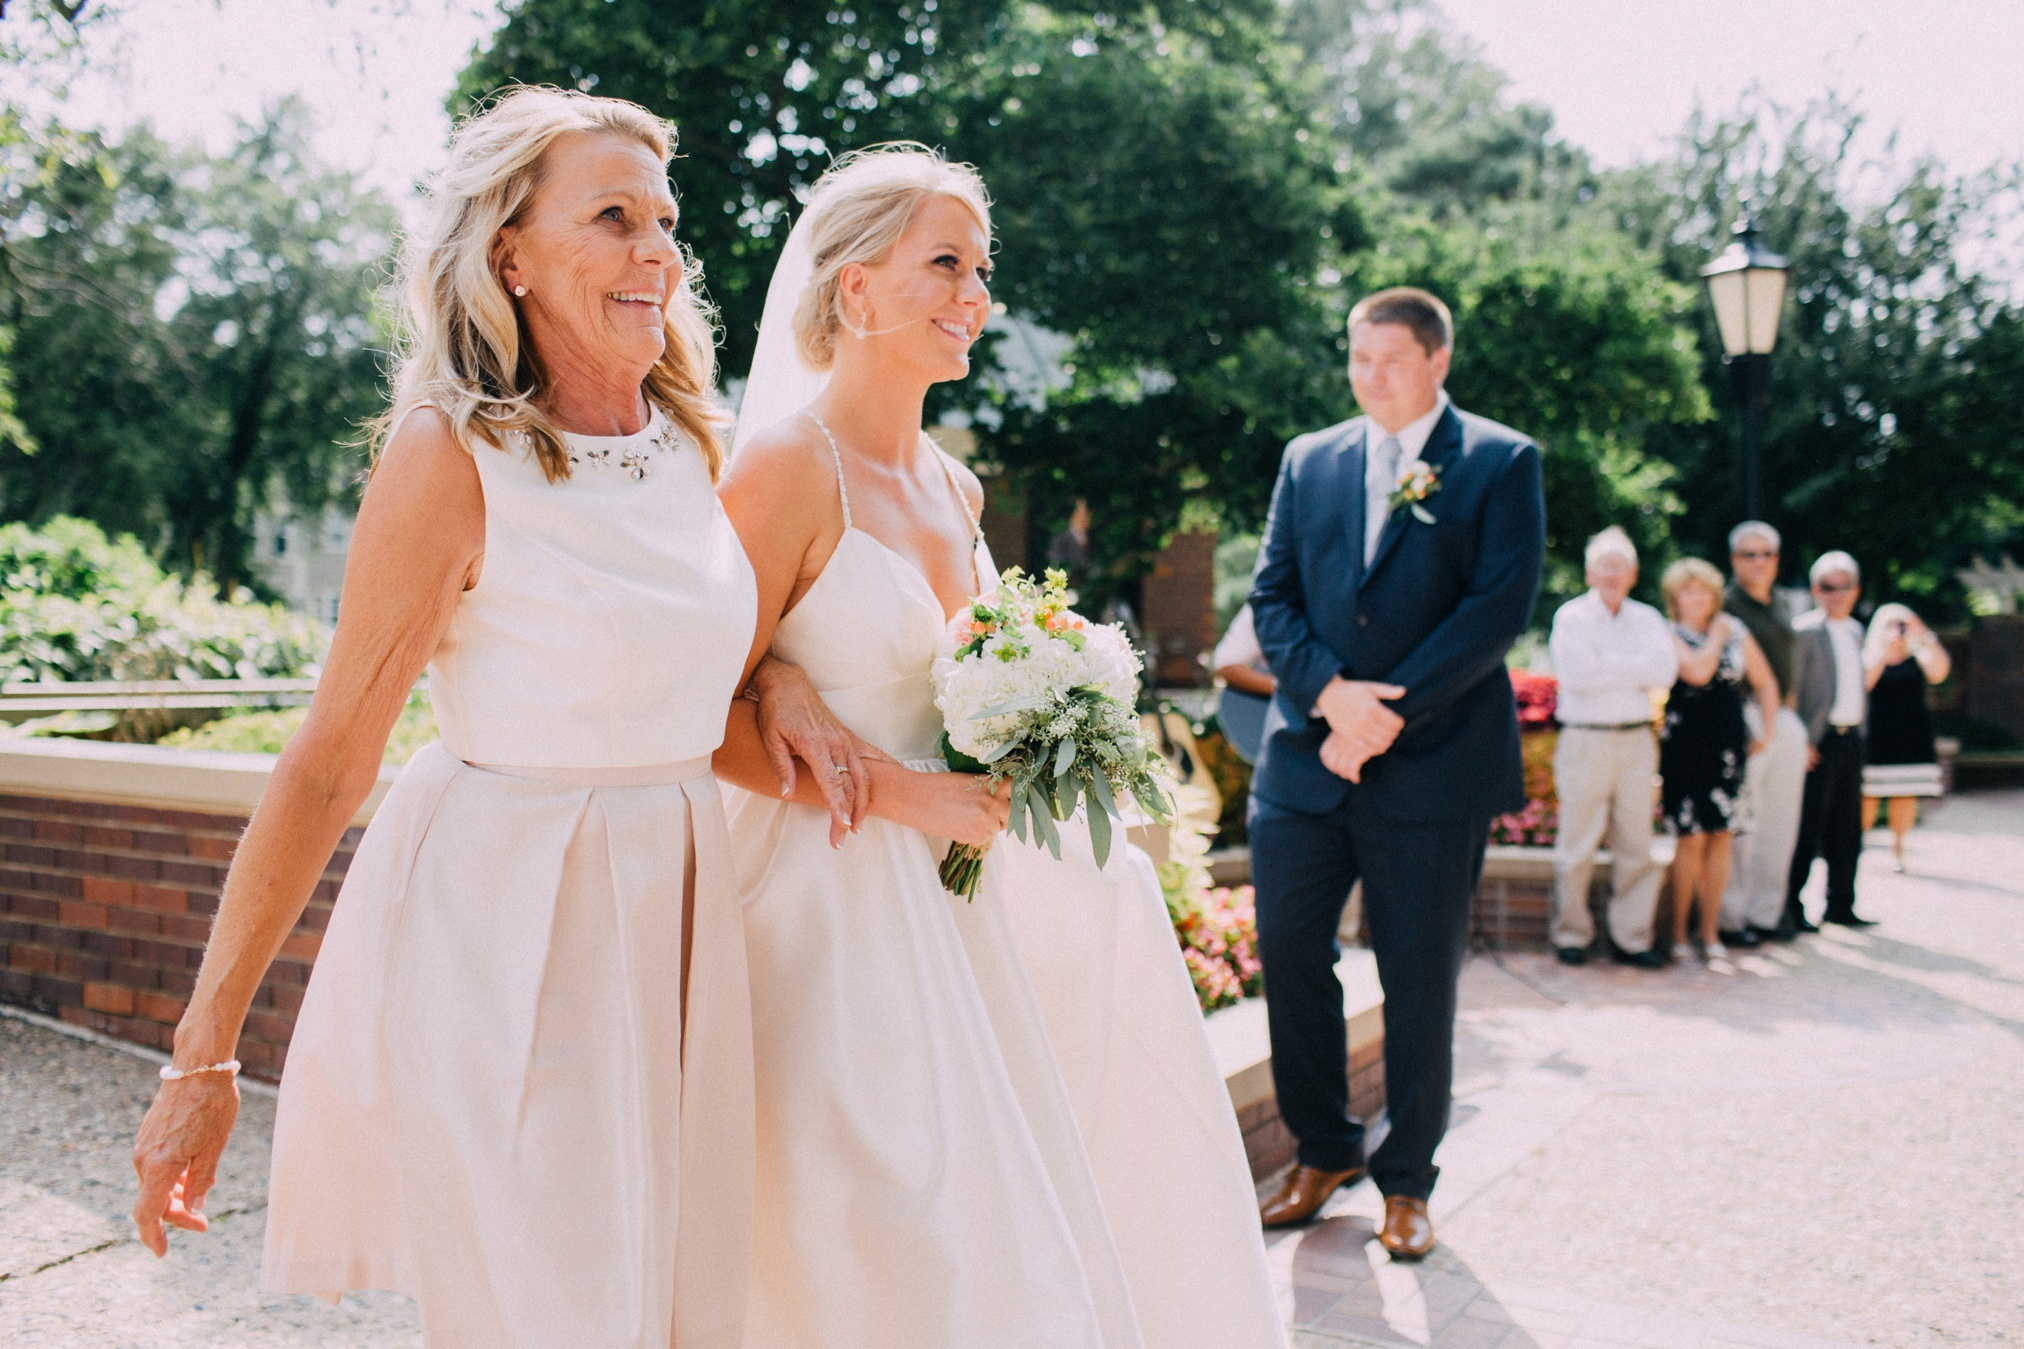 brenna+michael_wedding-387.jpg